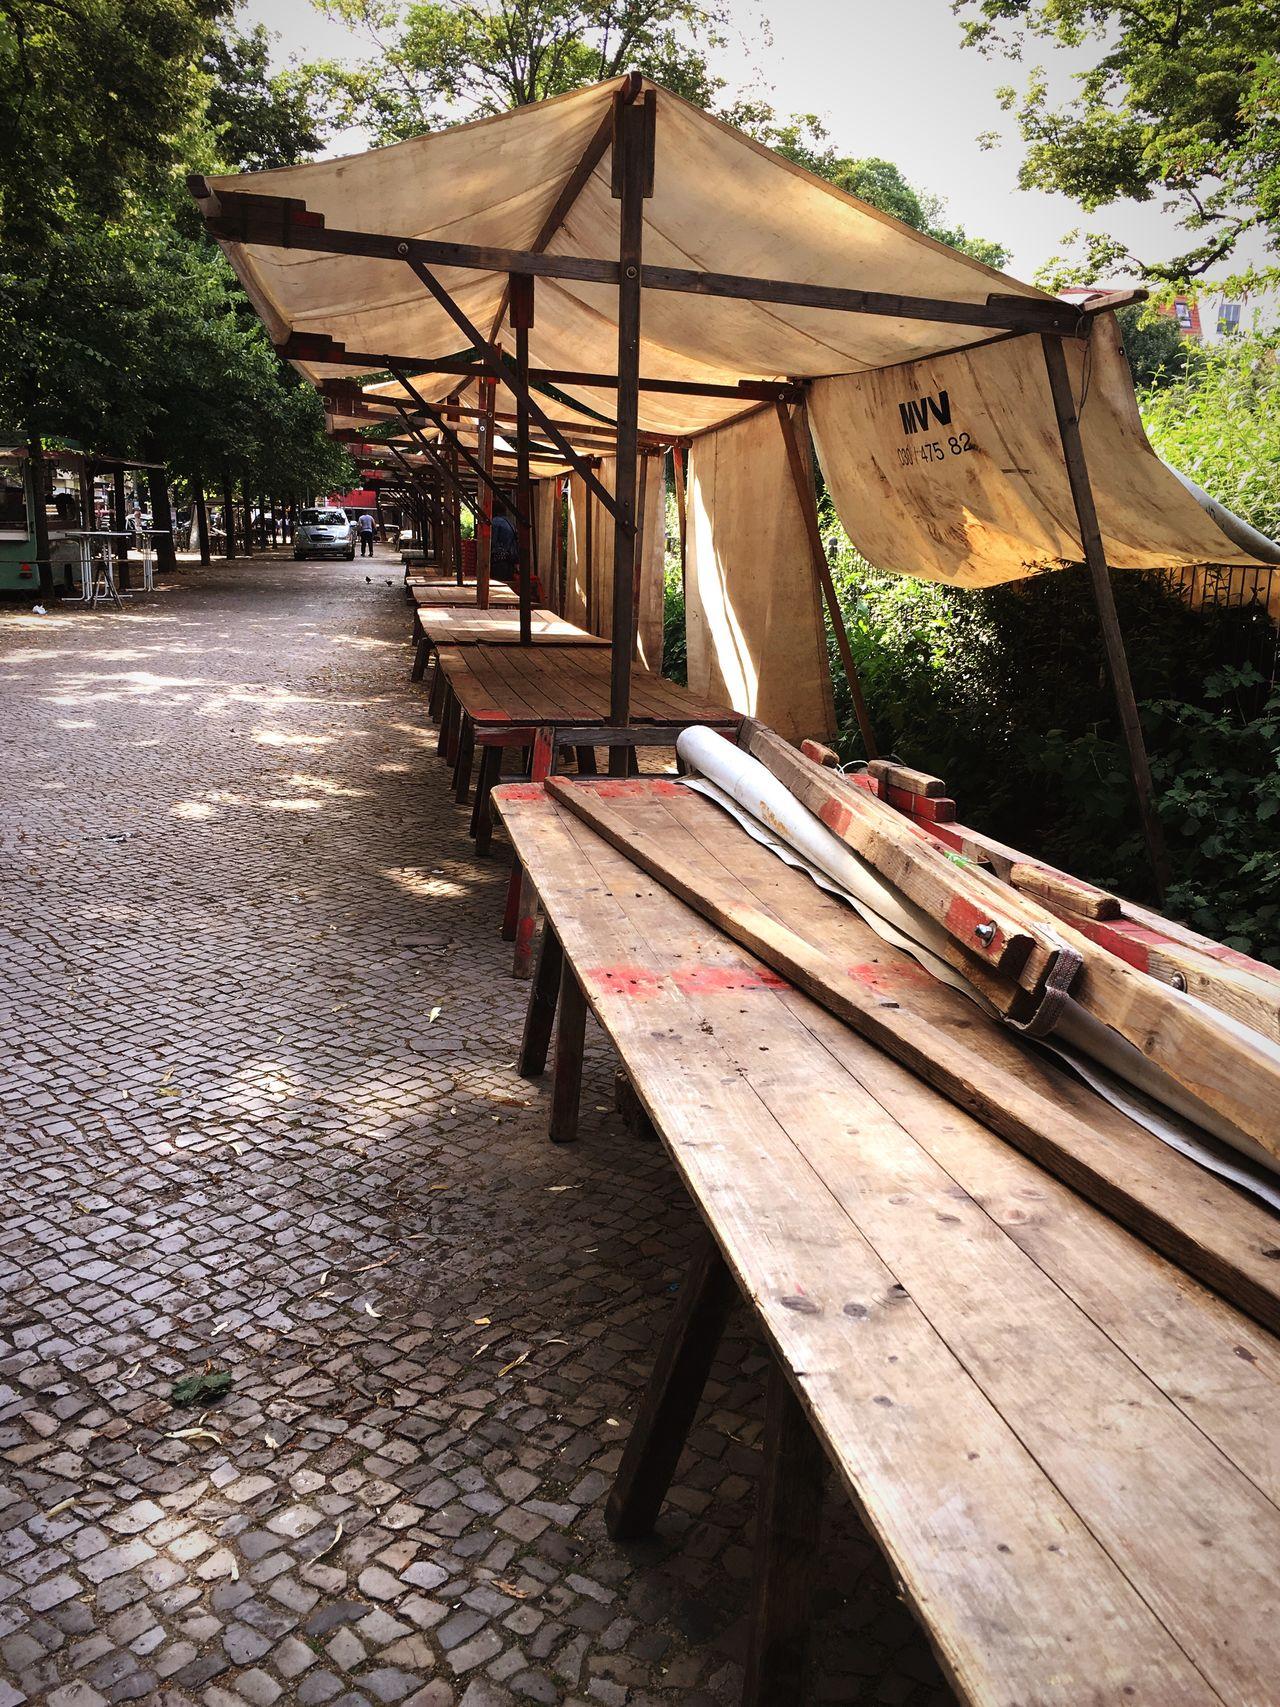 Abbau Boxhagenerplatz Wochenmarkt Empty No People